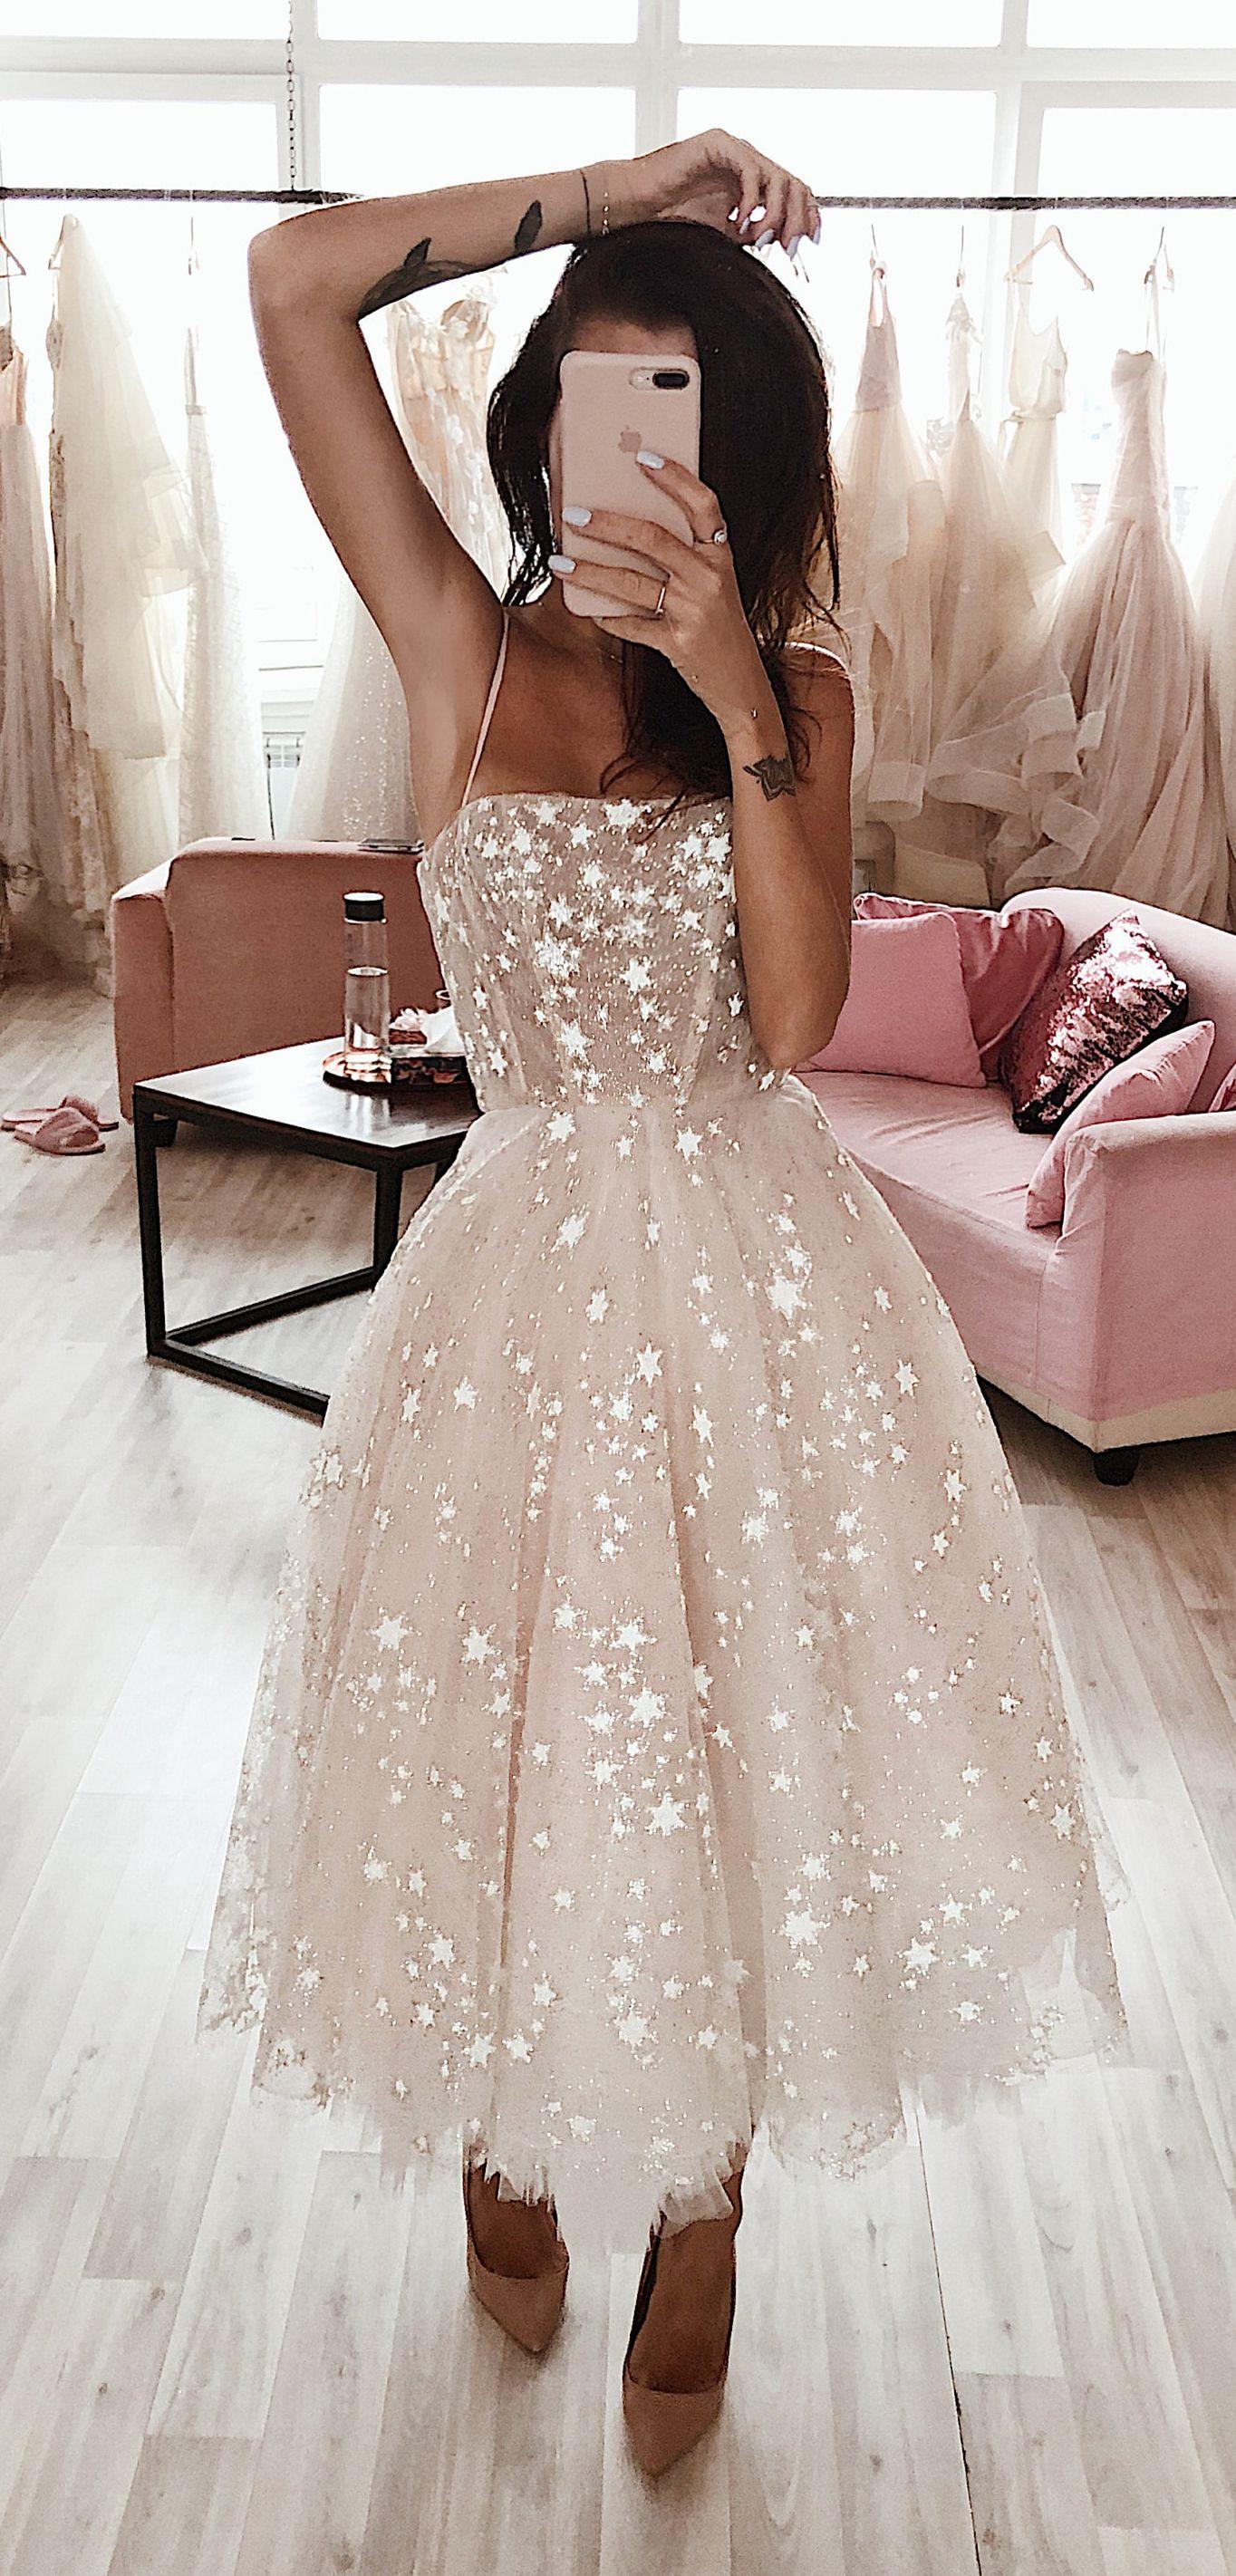 Dream Short Wedding Dresses Tea Legnth Pink Prom Dresses Unique A Line Prom Dresses With Beading Dres Midi Wedding Dress Sparkly Wedding Dress Gowns Dresses [ 2843 x 1364 Pixel ]